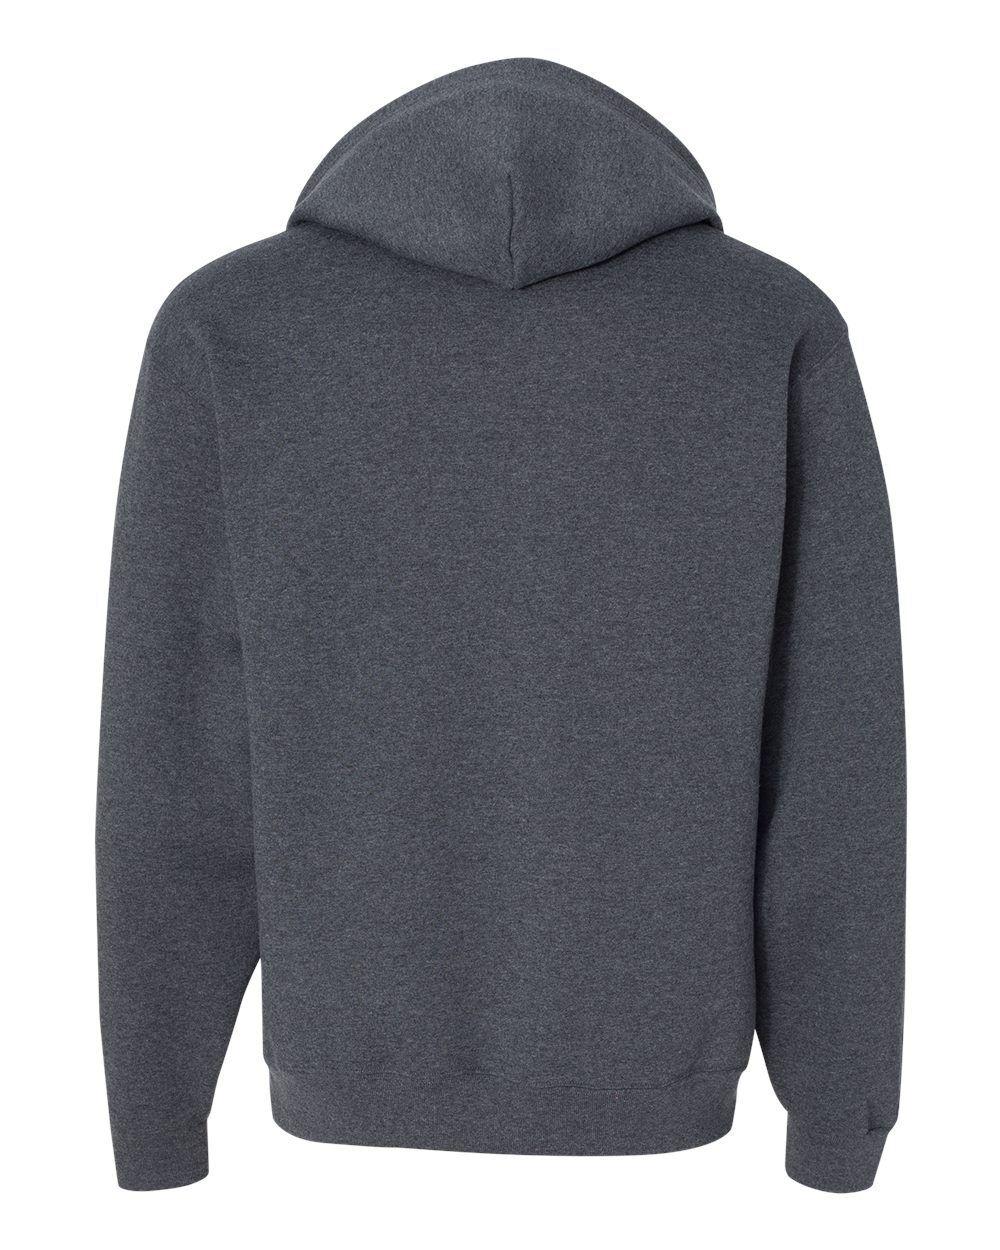 Peaches Pick Mens S-L XL 2XL 3XL NuBlend 1//4 Zip Hooded Sweatshirt Hoodie Jumper